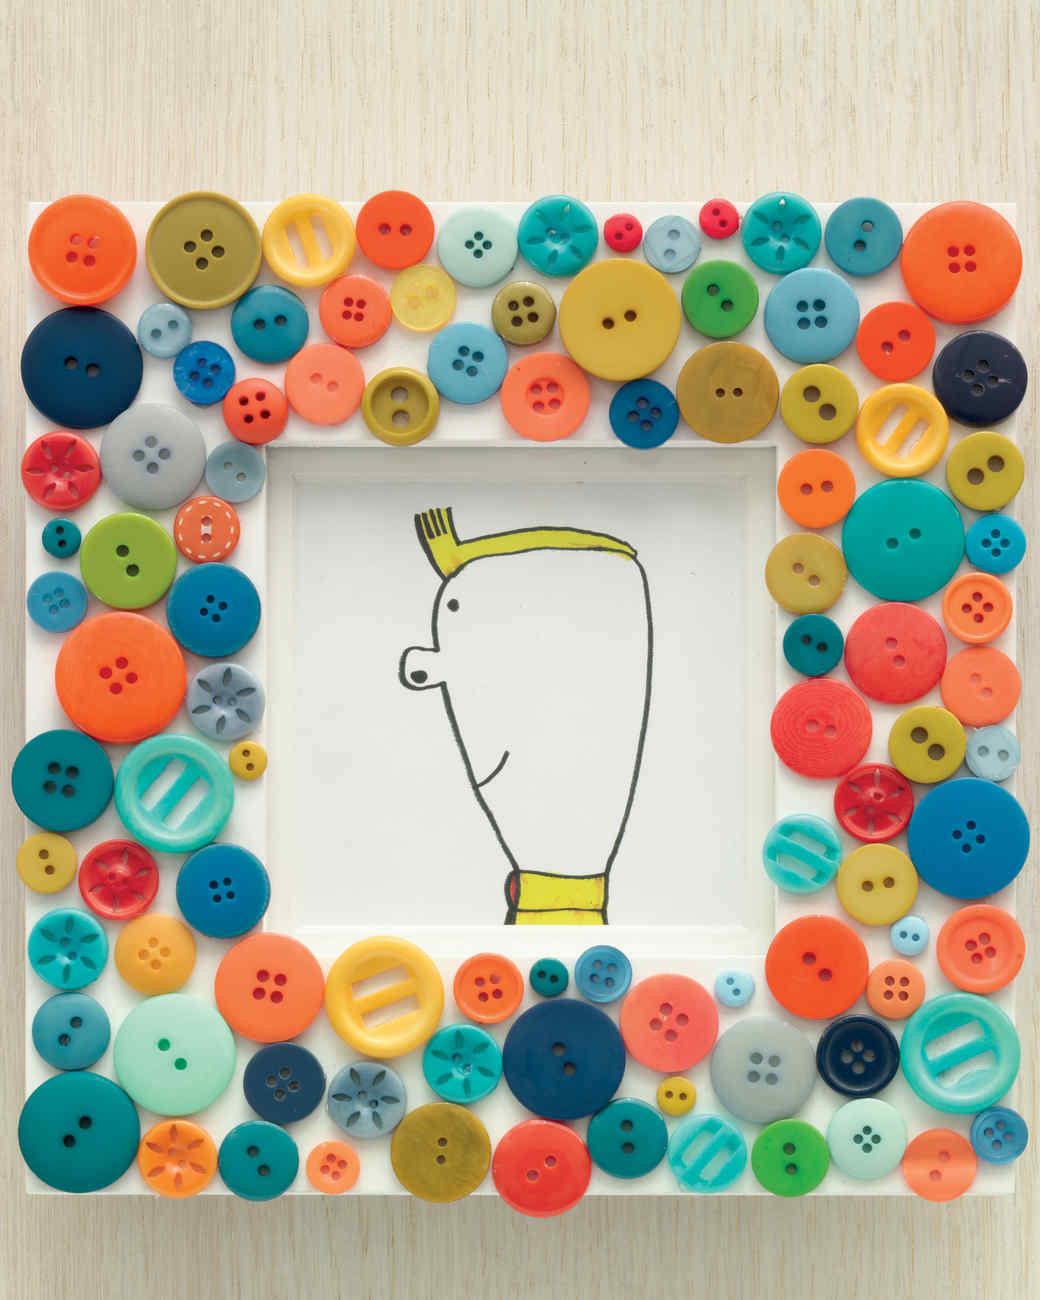 Best ideas about Crafts Fir Kids . Save or Pin Martha Stewart s Favorite Crafts for Kids Now.